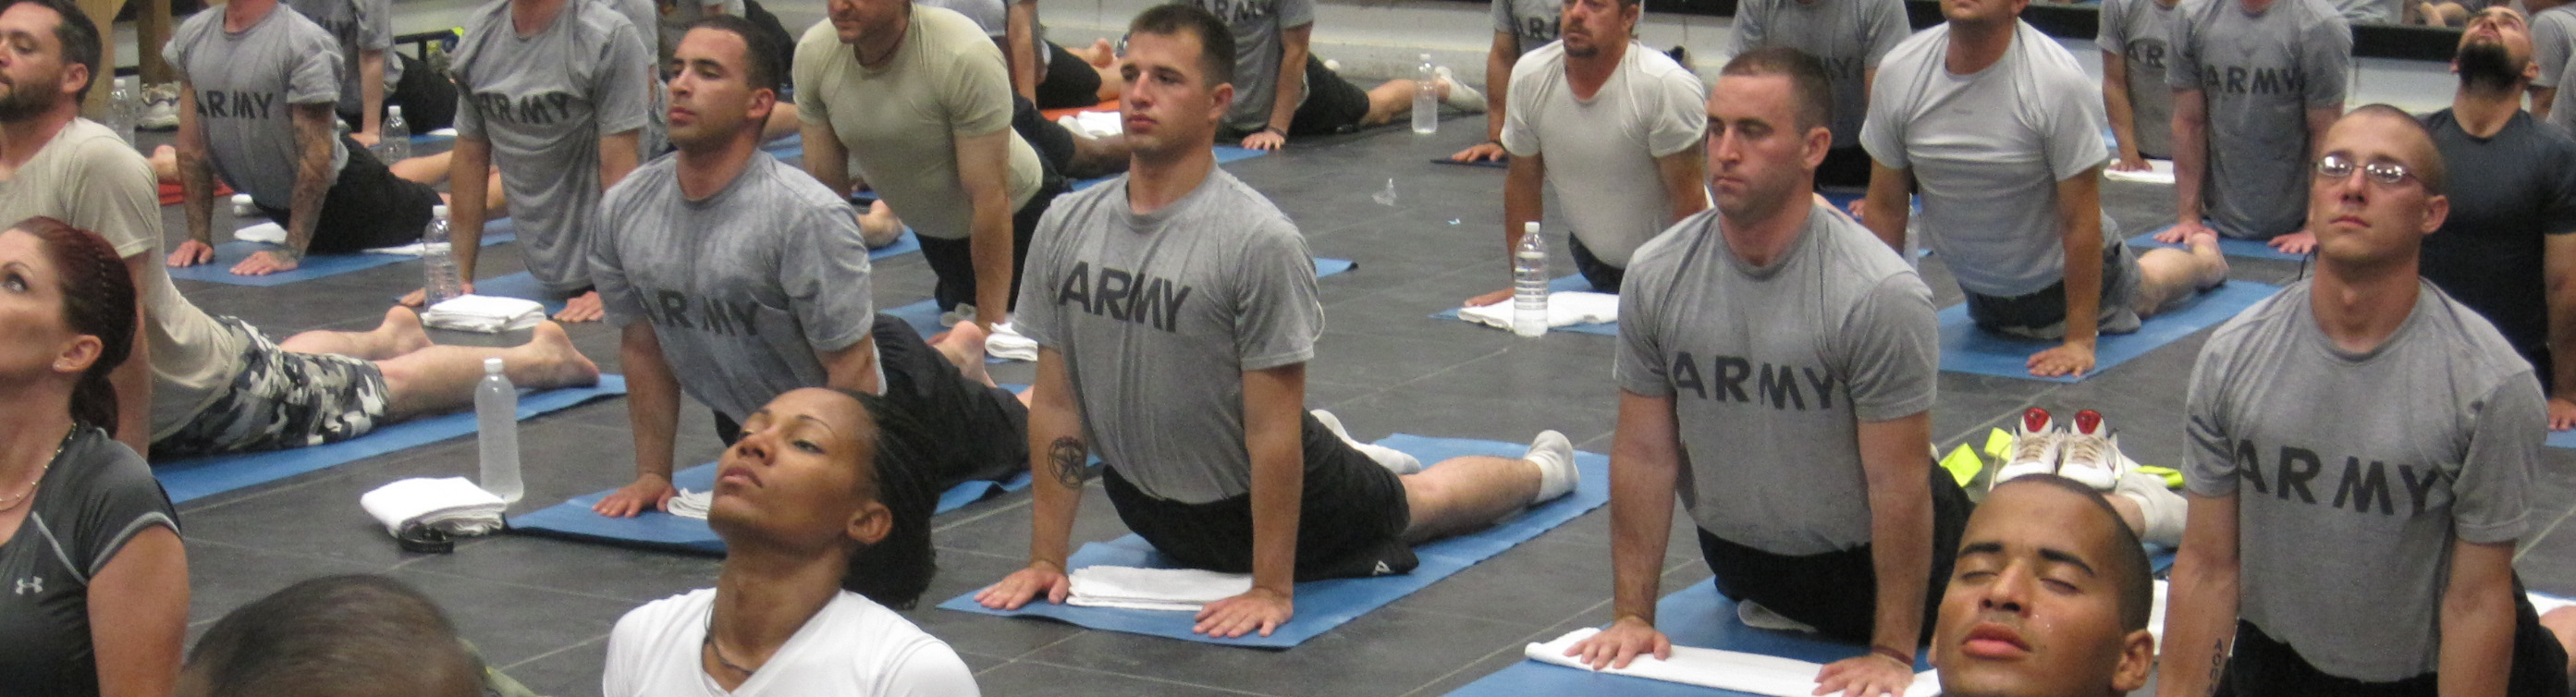 Yoga for Veterans at SYF2014